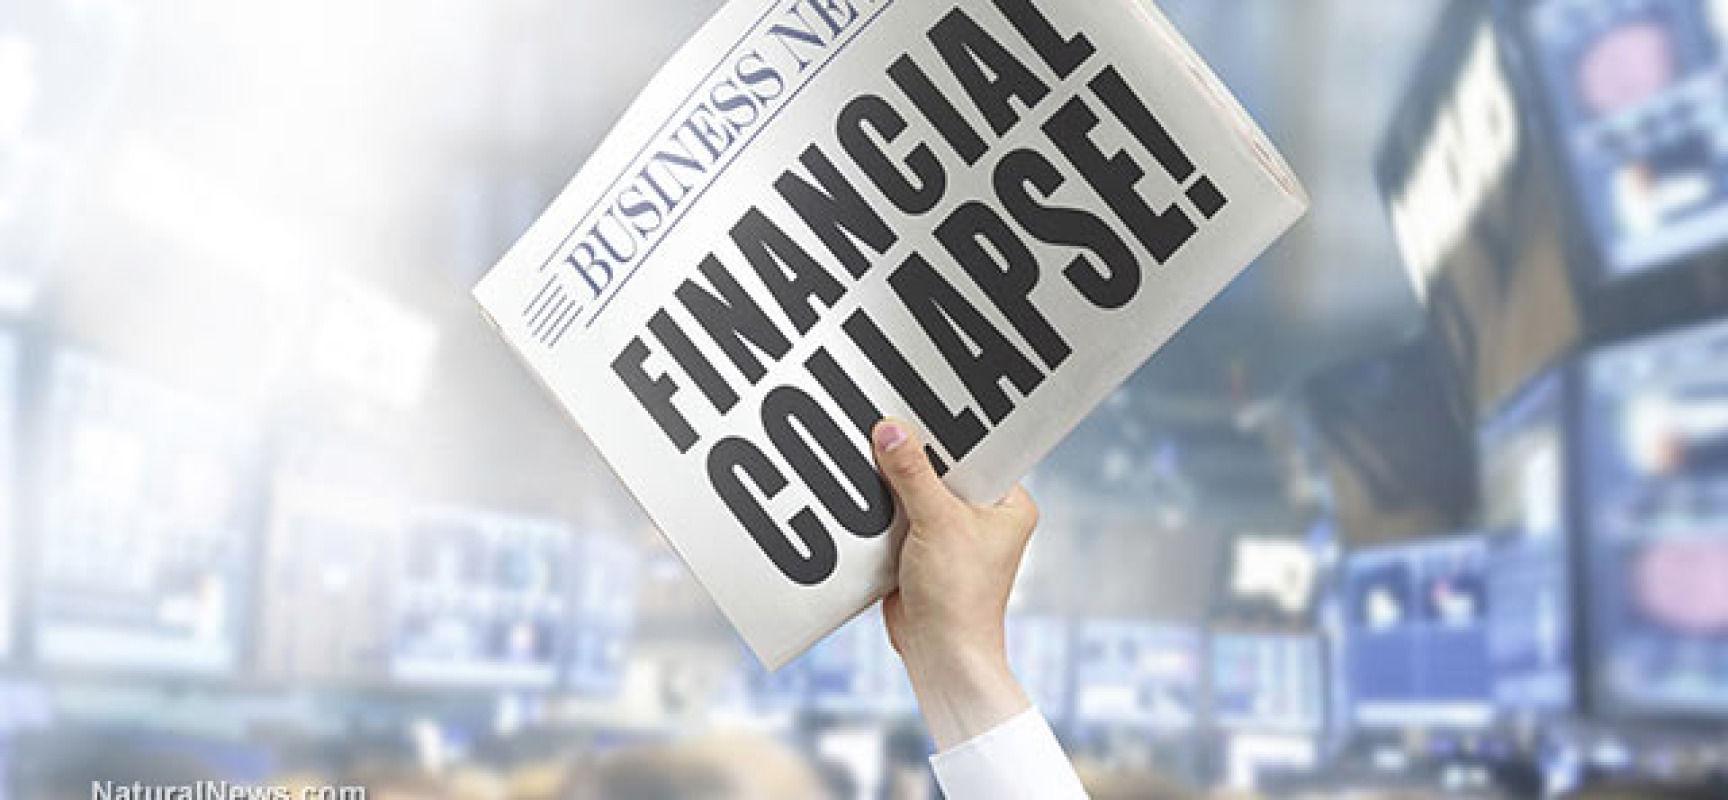 www.sott.net/image/s11/220057/full/Newspaper_With_Financial_Colla.jpg